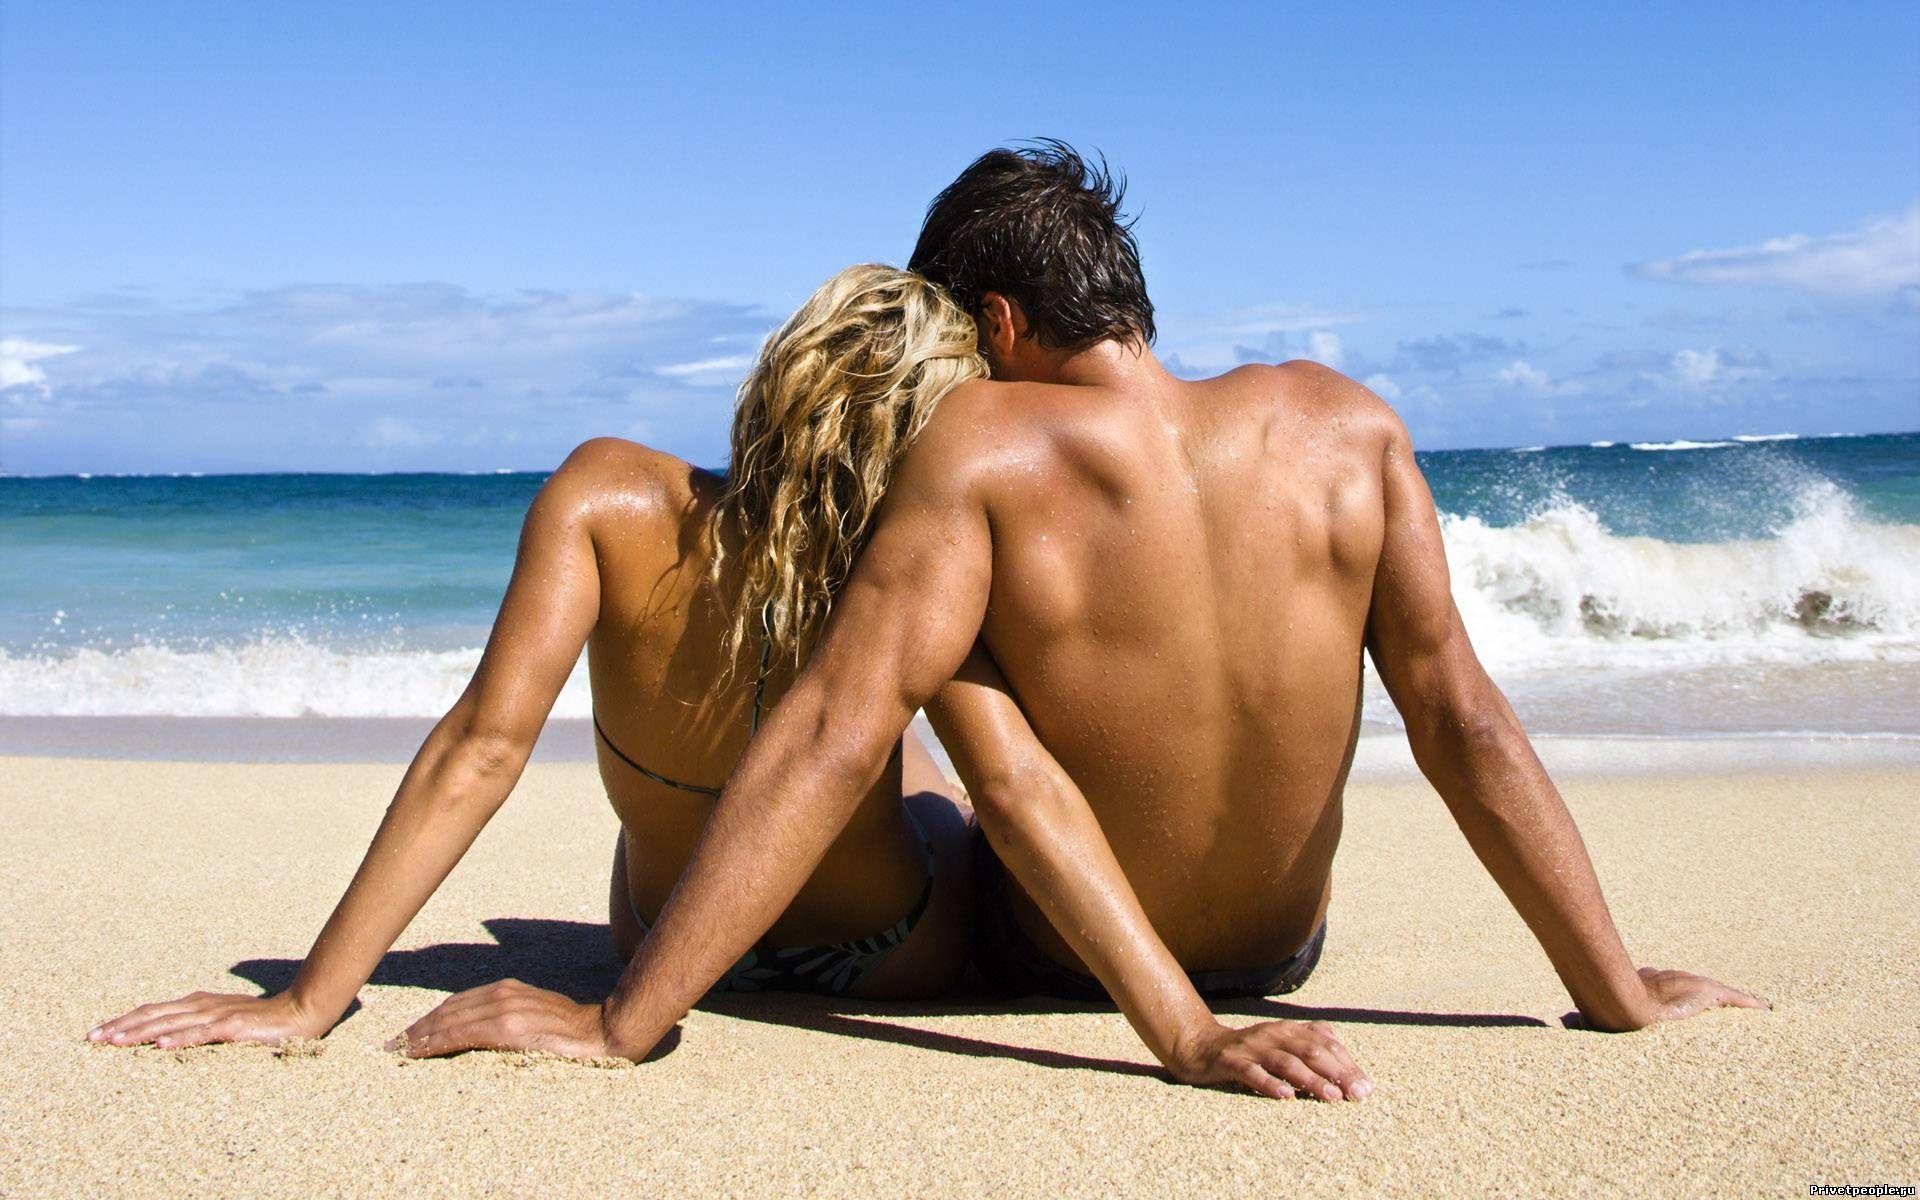 Картинка девушка с парнем на пляже